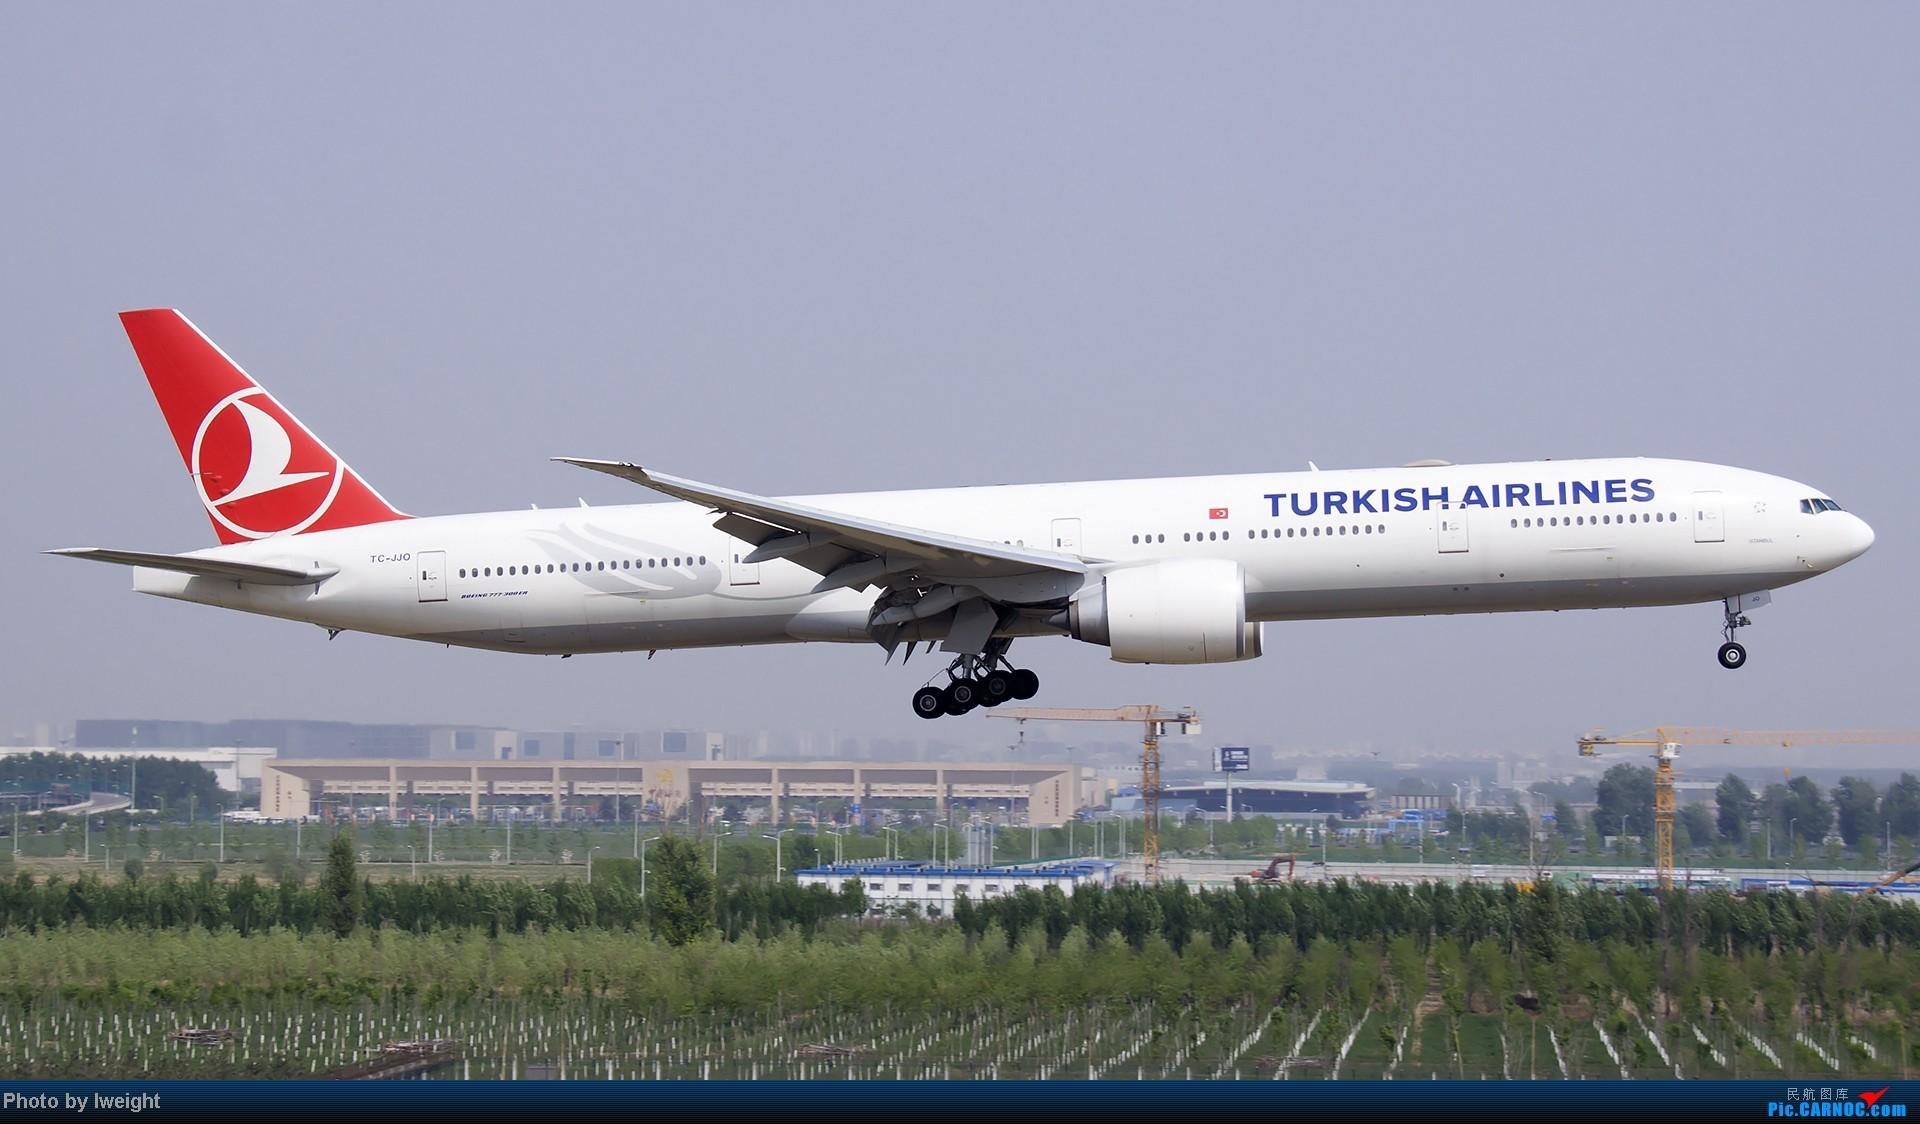 Re:[原创]错过了卡航的巴塞罗那号,只有这些大路货了,泪奔啊 BOEING 777-300ER TC-JJO 中国北京首都机场